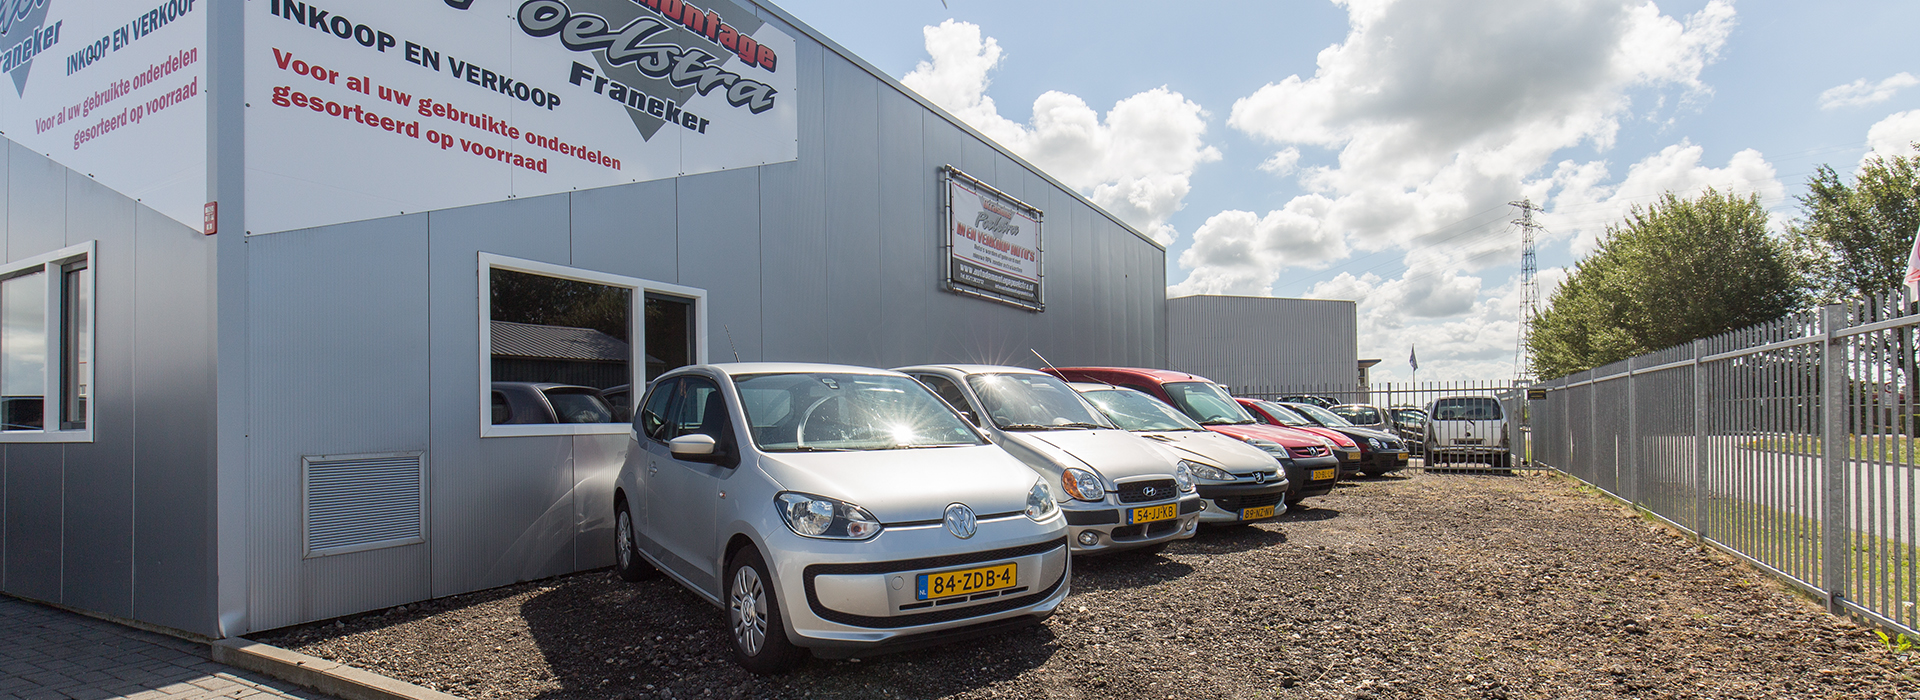 Auto inkoop Friesland